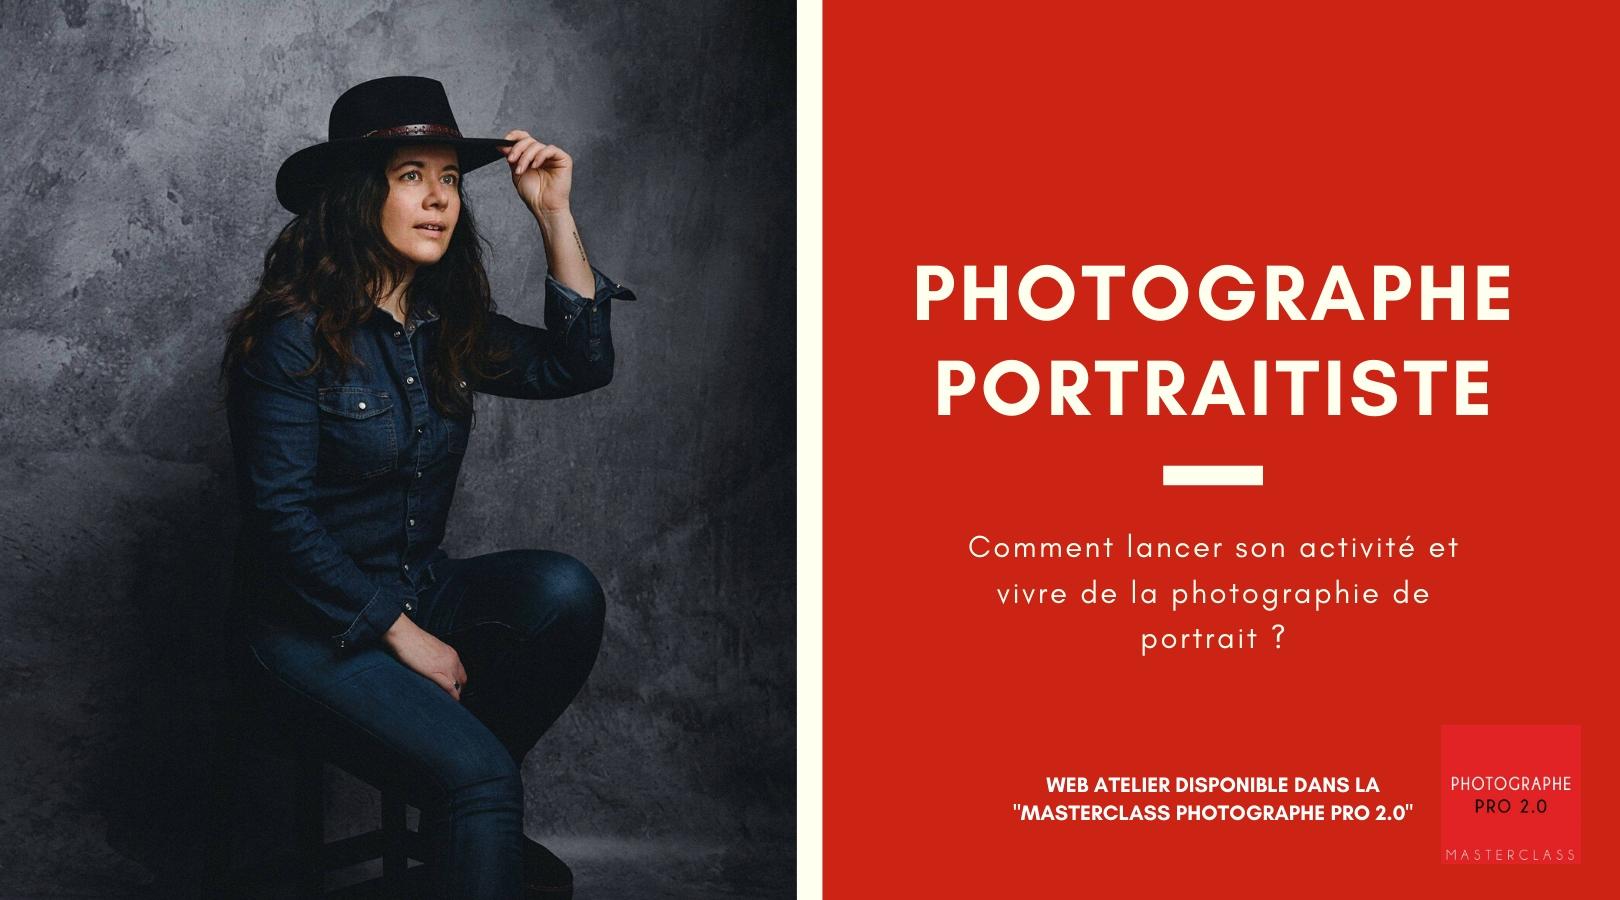 milena photographe portraitiste